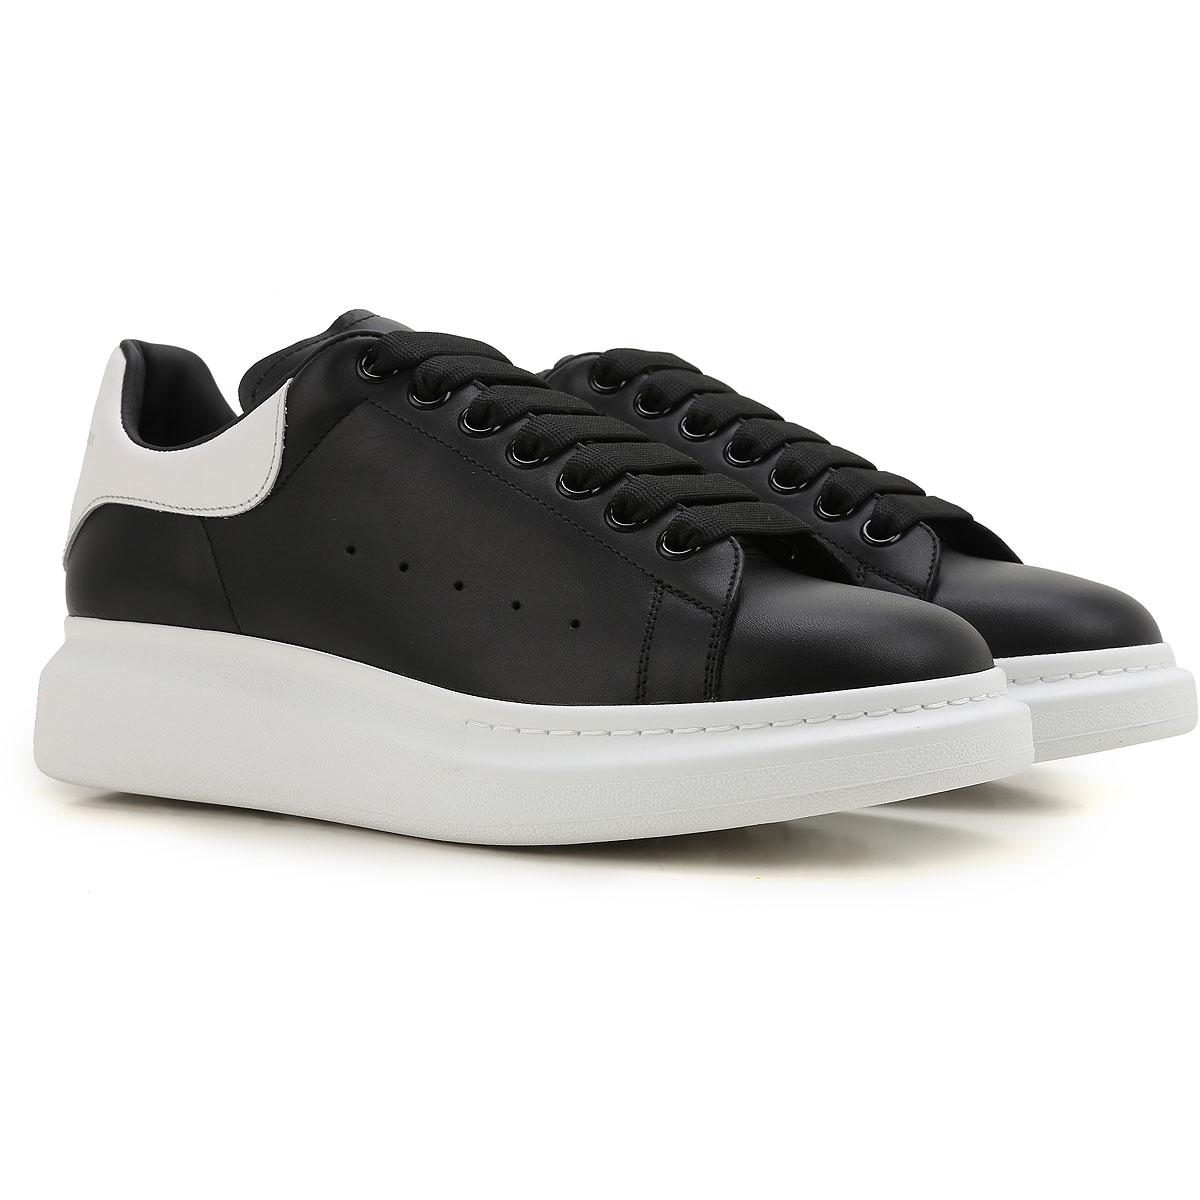 Mens Shoes Alexander McQueen, Style code: 441631-whgp5-1070